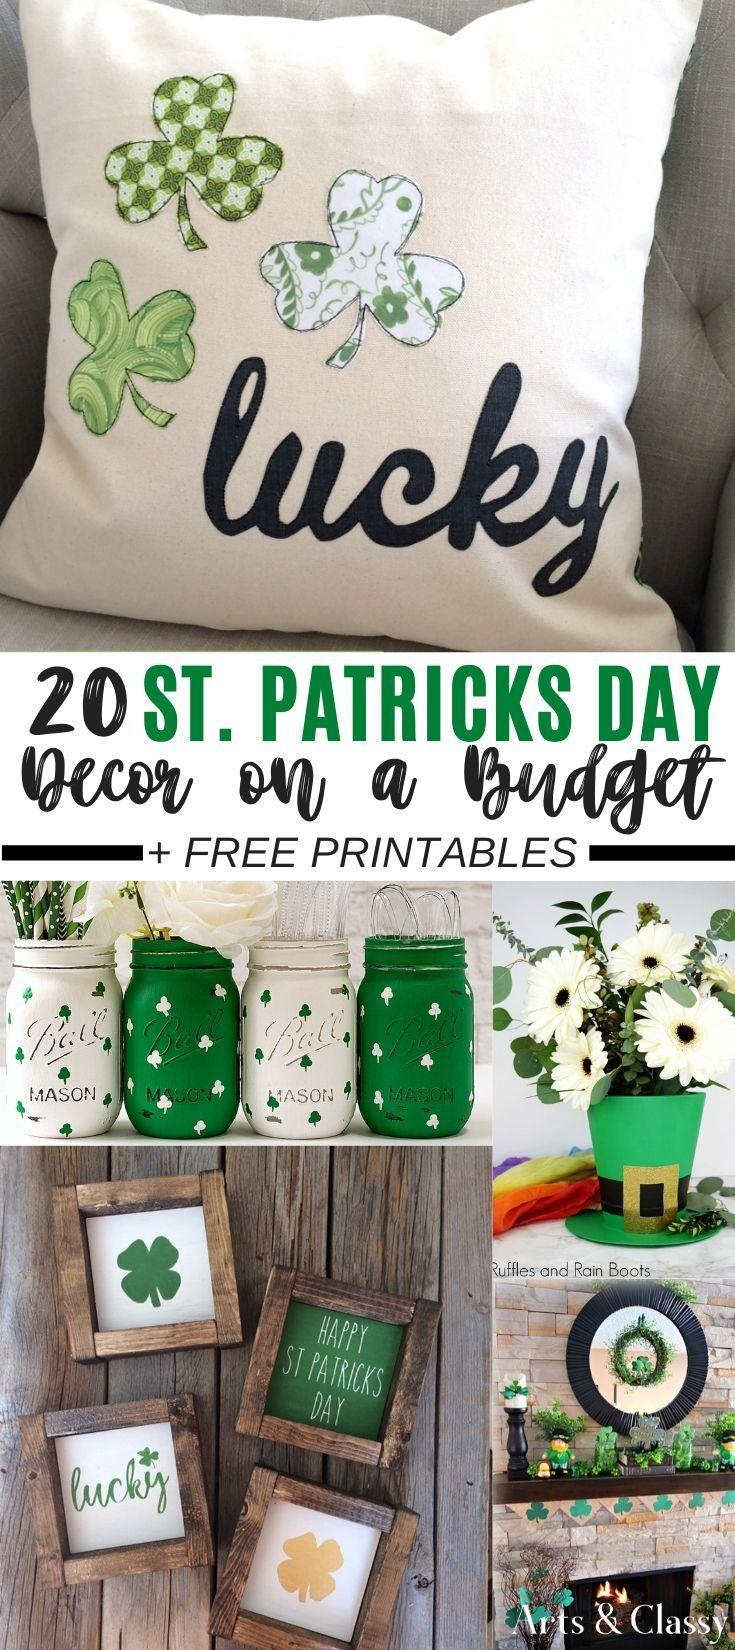 St Patricks Day Decor Ideas Free Printables Arts And Classy St Patrick S Day Decorations St Patrick S Day Diy St Patrick S Day Crafts